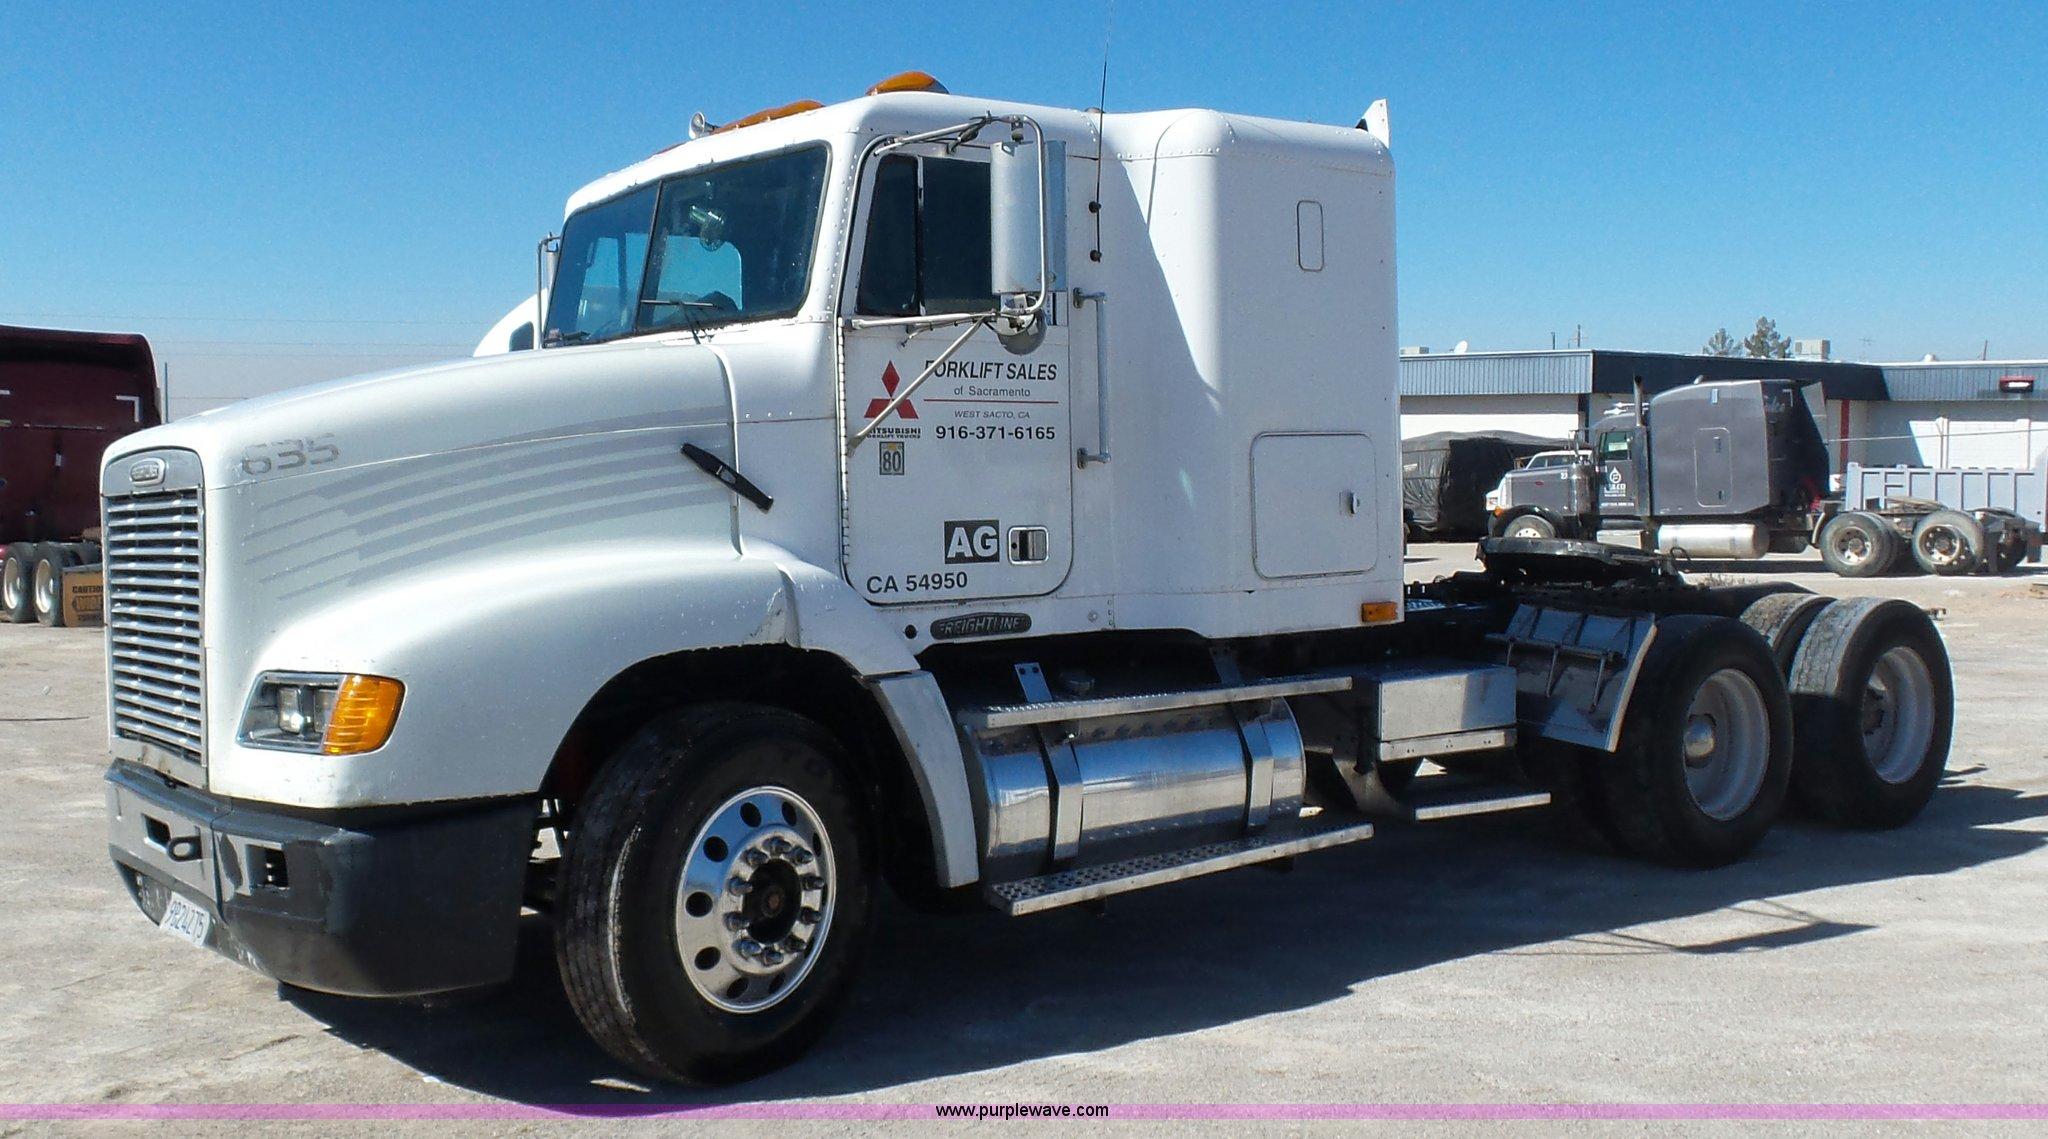 1996 freightliner fld112 semi truck in el paso tx item k5760 sold purple wave 1996 freightliner fld112 semi truck in